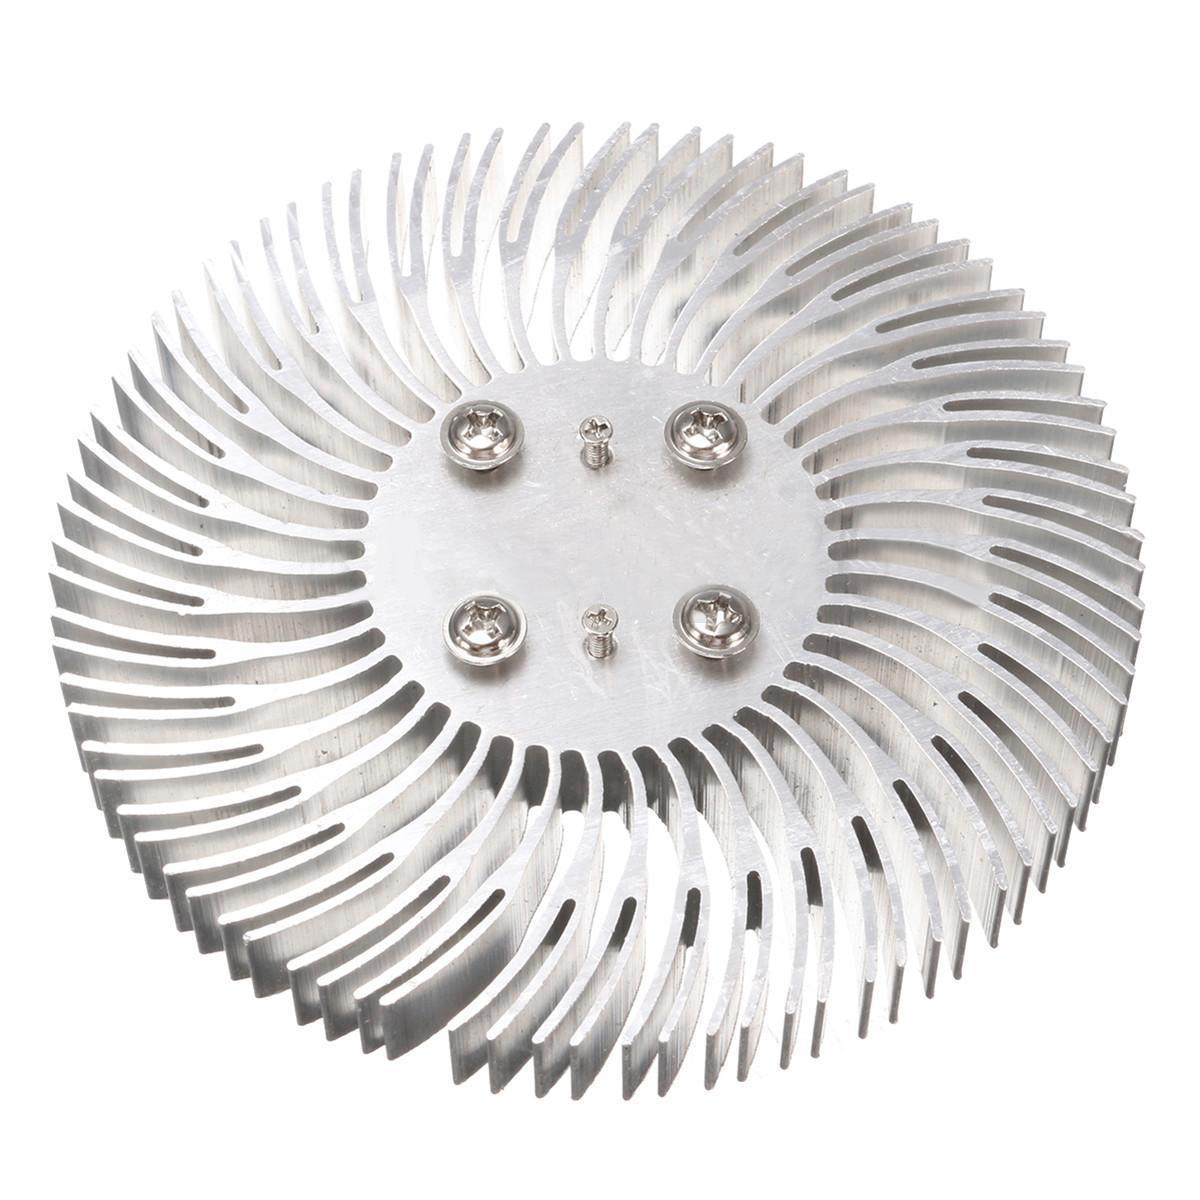 1pc Mayitr Round Spiral Aluminum Heatsink Cooler Led Heat Sink Radiator 90*10mm For 10W High Power LED Light Lamp